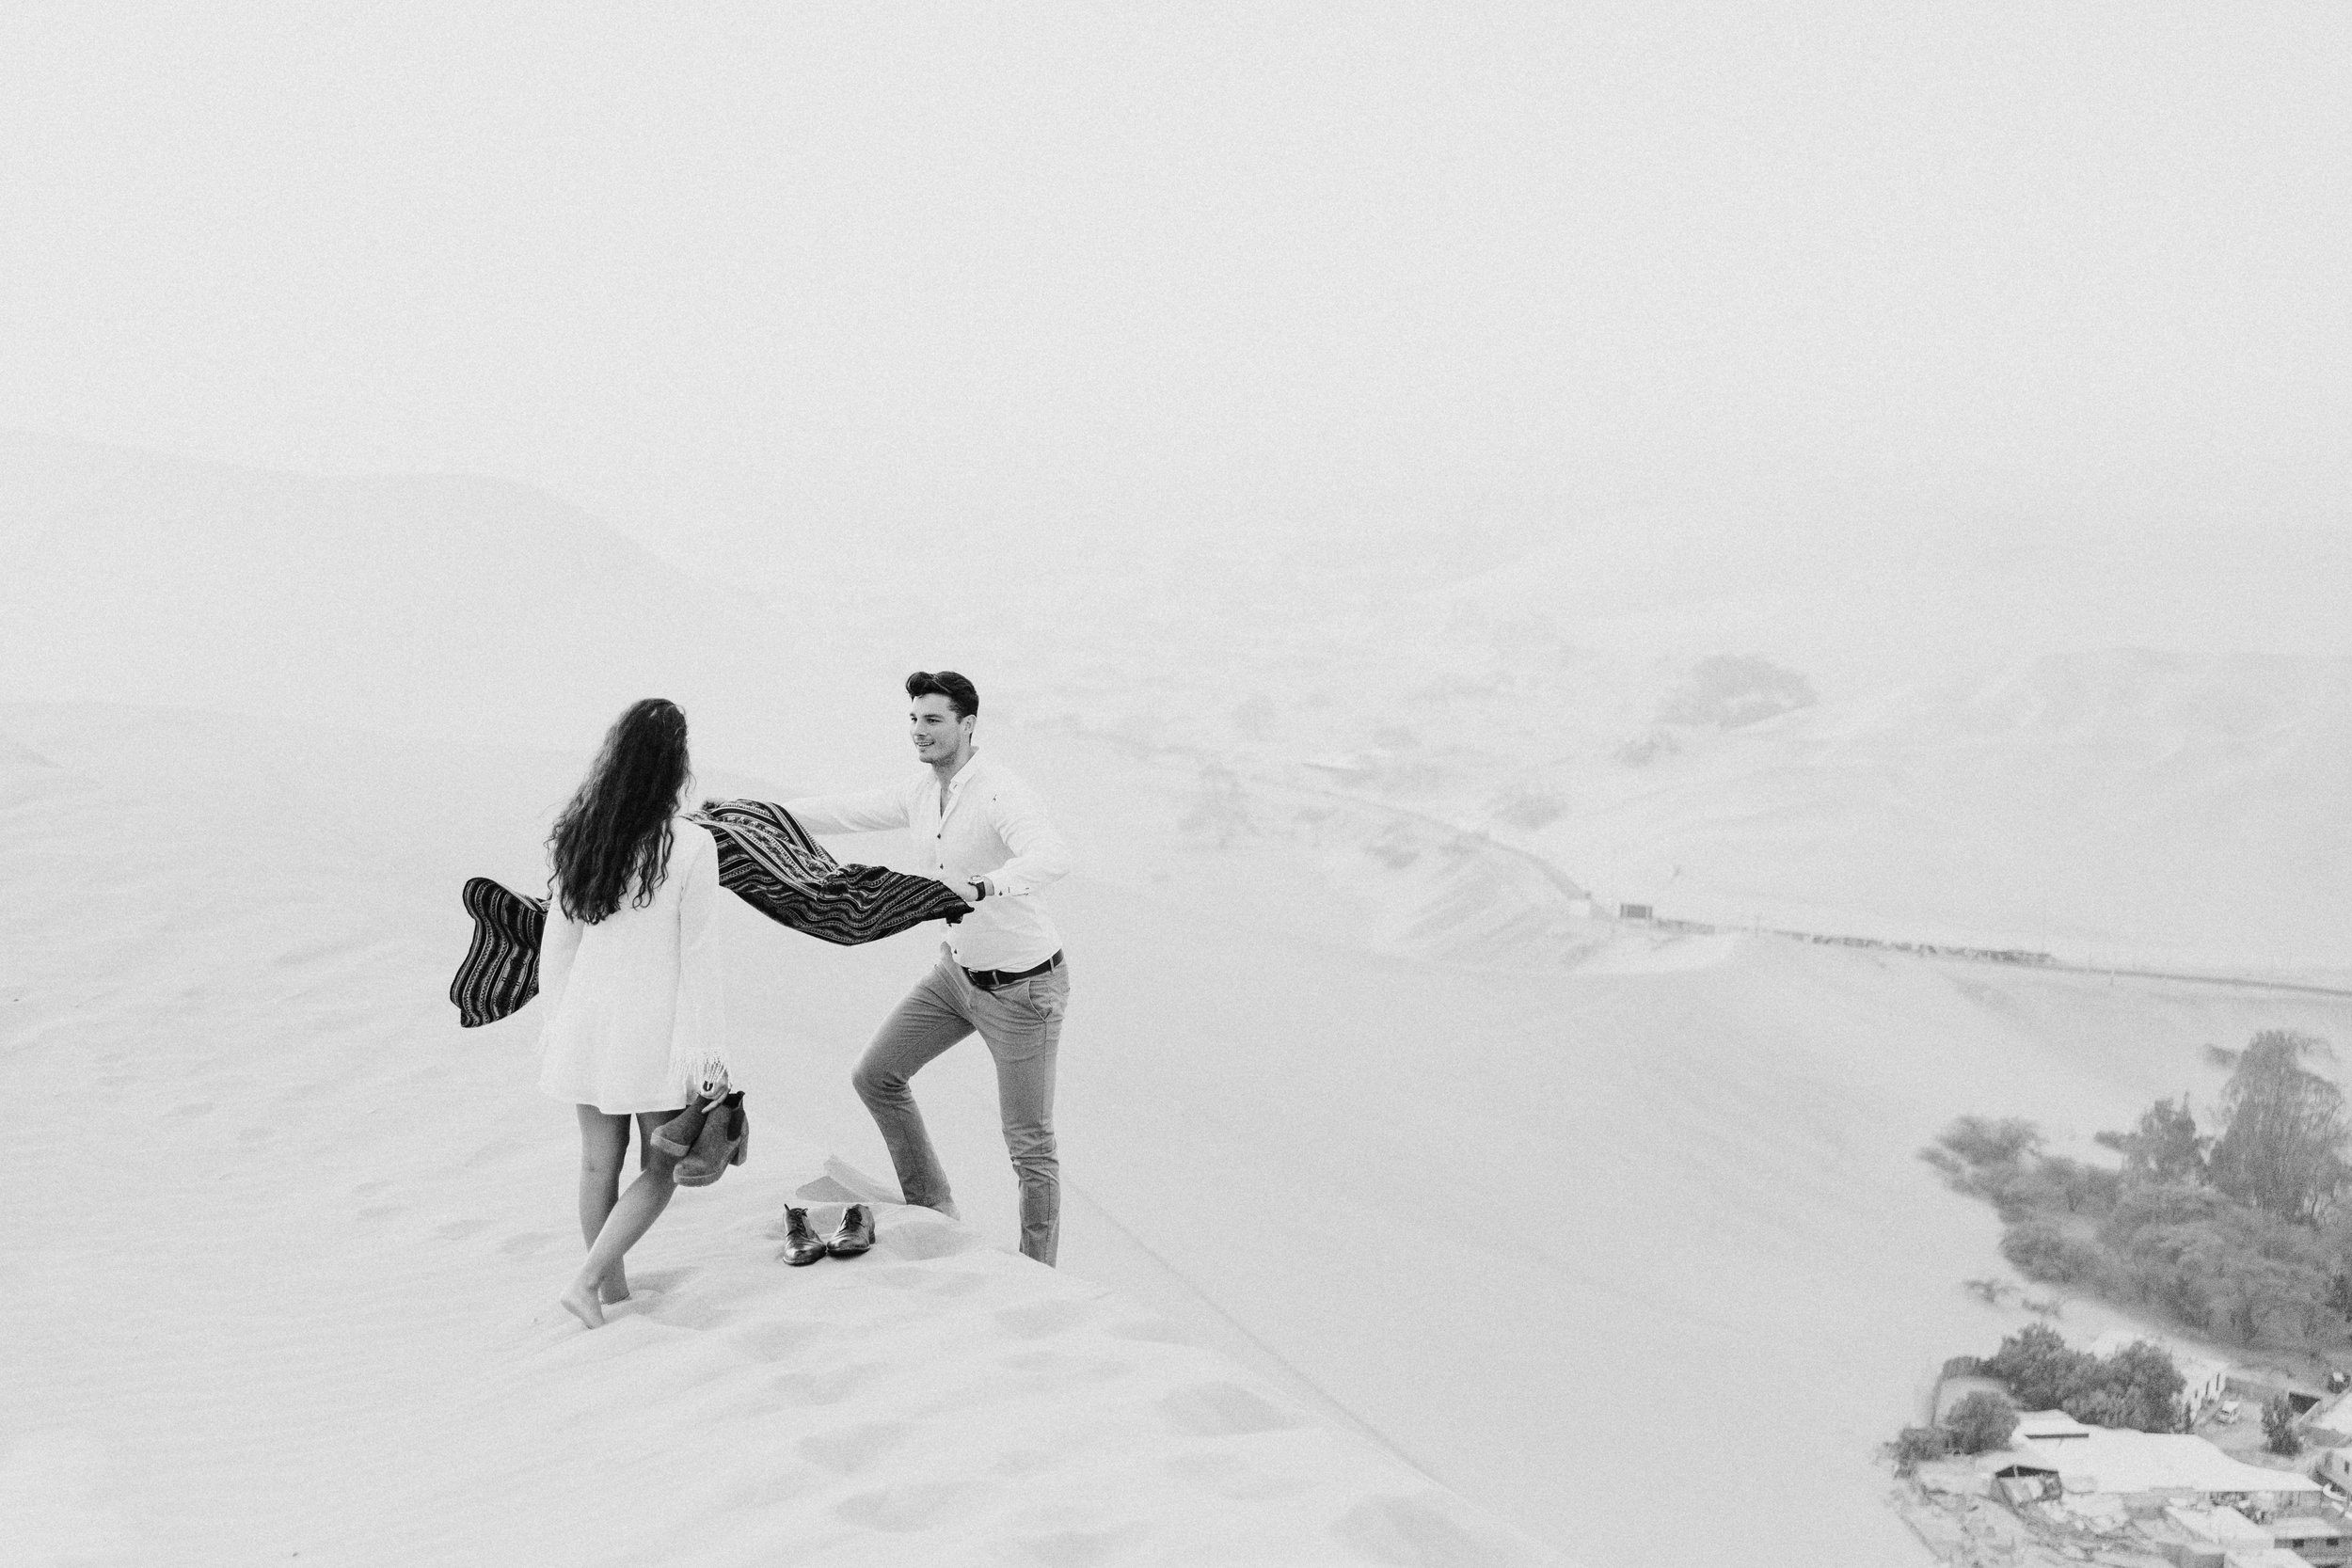 huacachina-peru-honeymoon-elopement-destination-wedding-photography-michael-cozzens-18.jpg